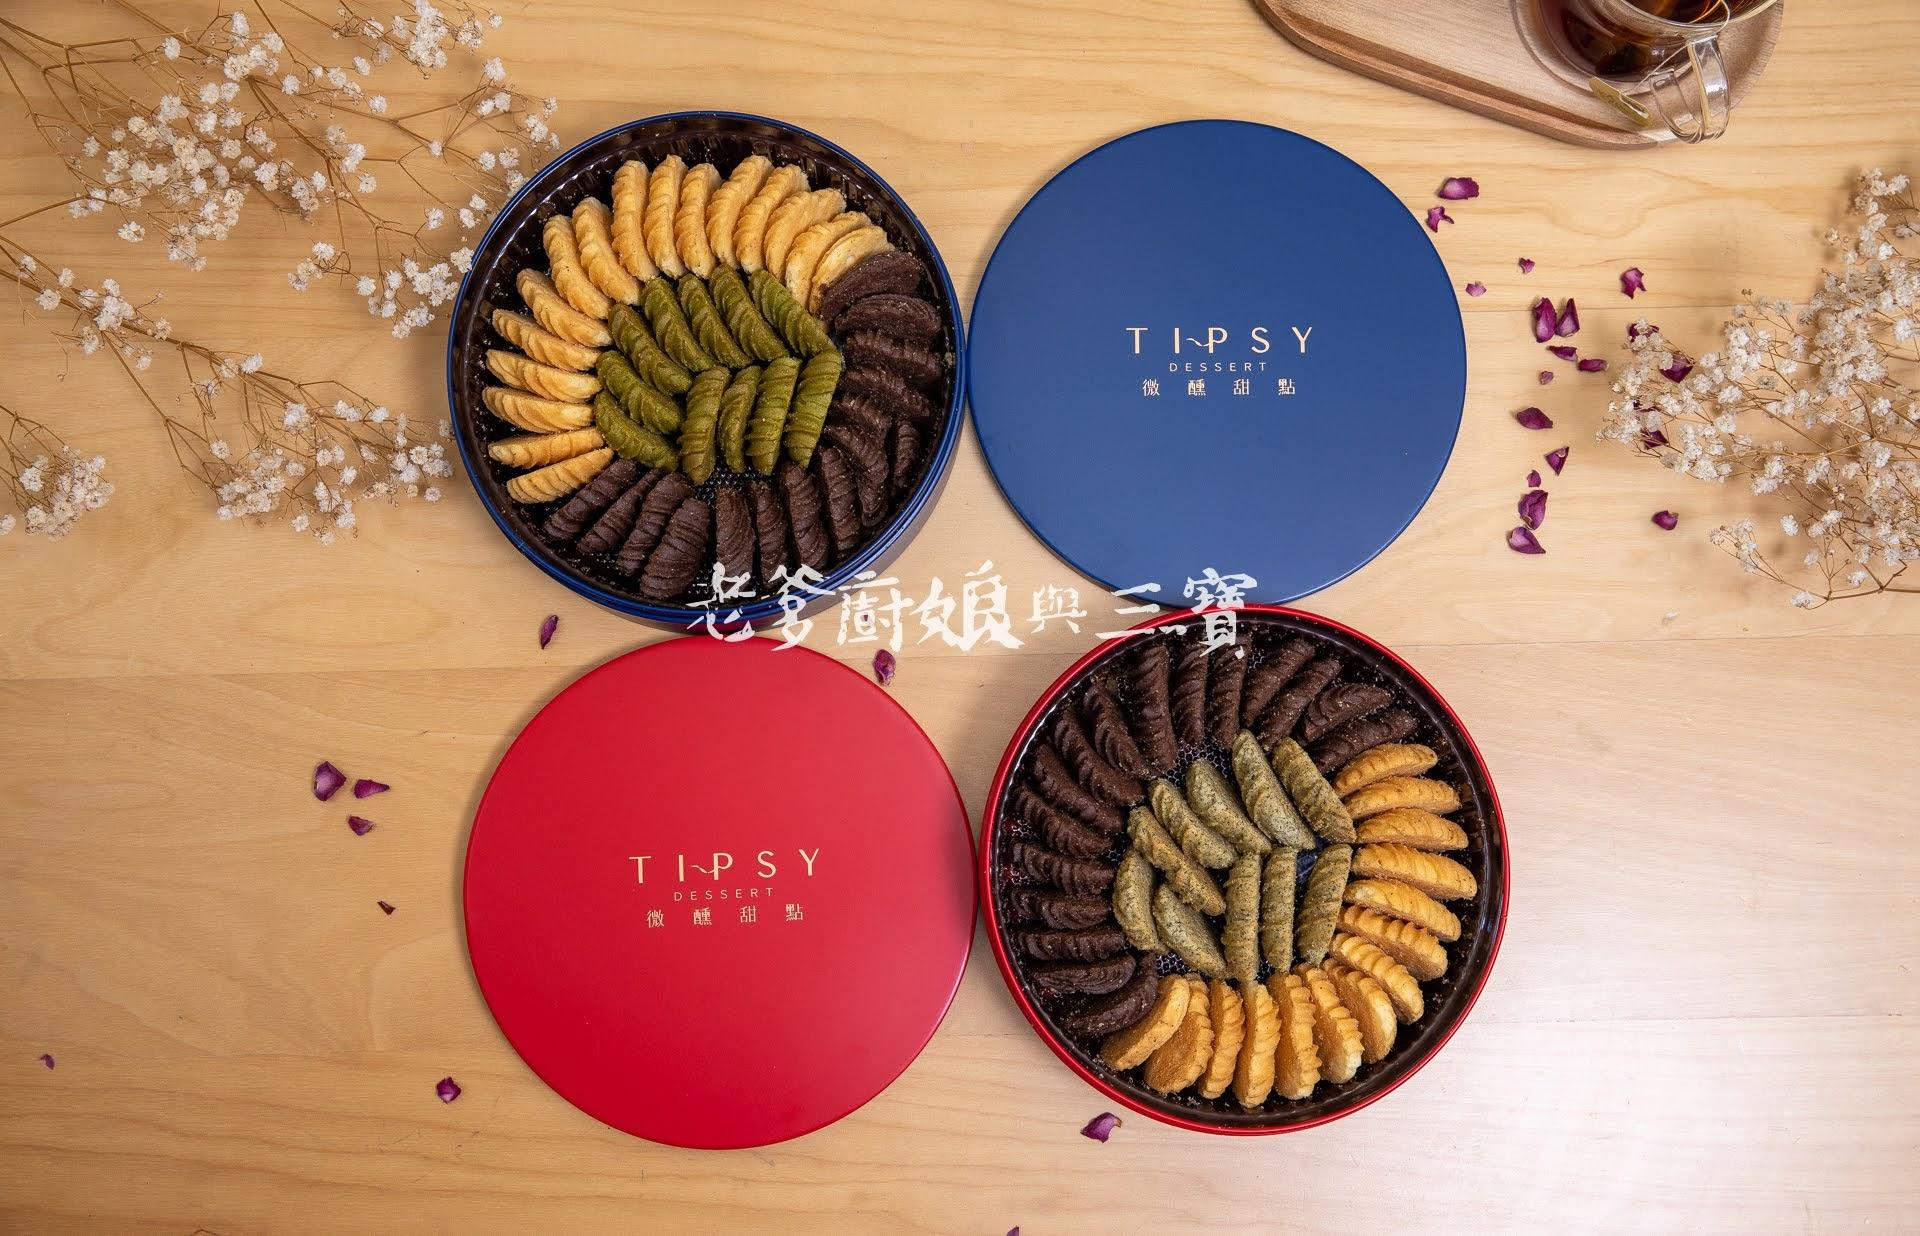 【Tipsy Dessert 微醺甜點】宅配甜點愛心曲奇鐵盒禮盒,好吃的讓人一口接一口停不下來